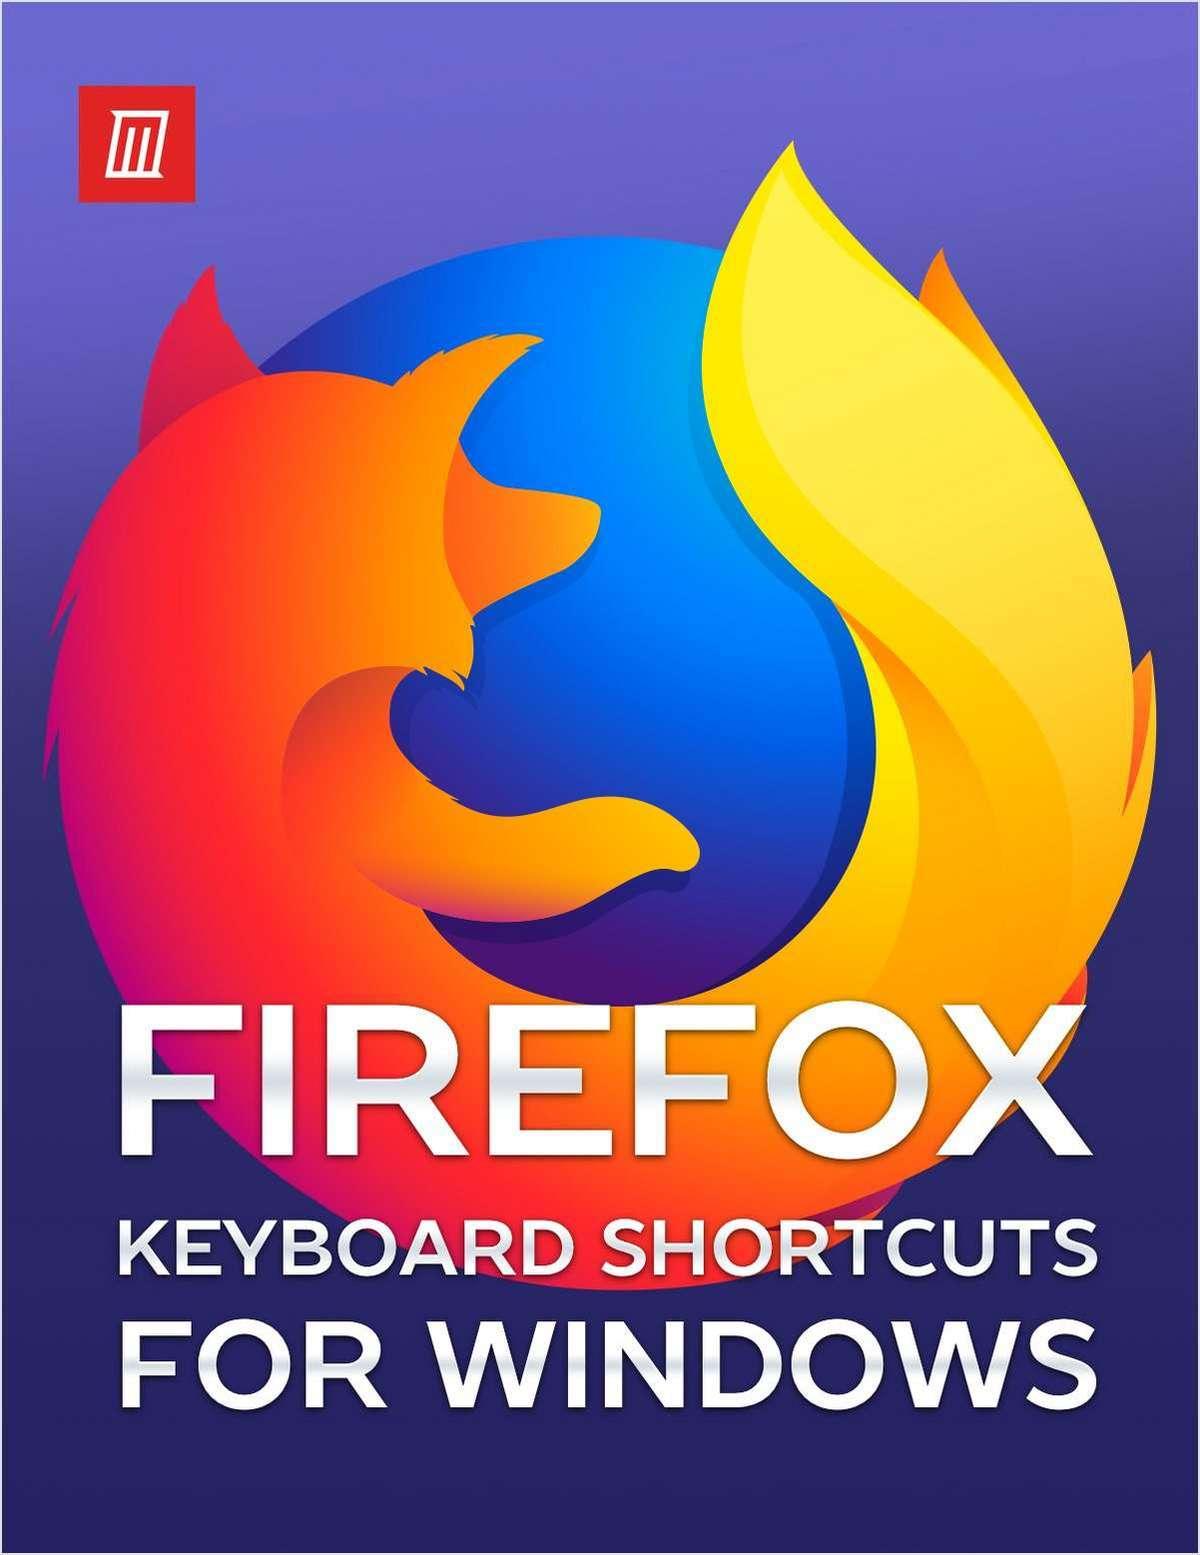 Mozilla Firefox Keyboard Shortcuts for Windows